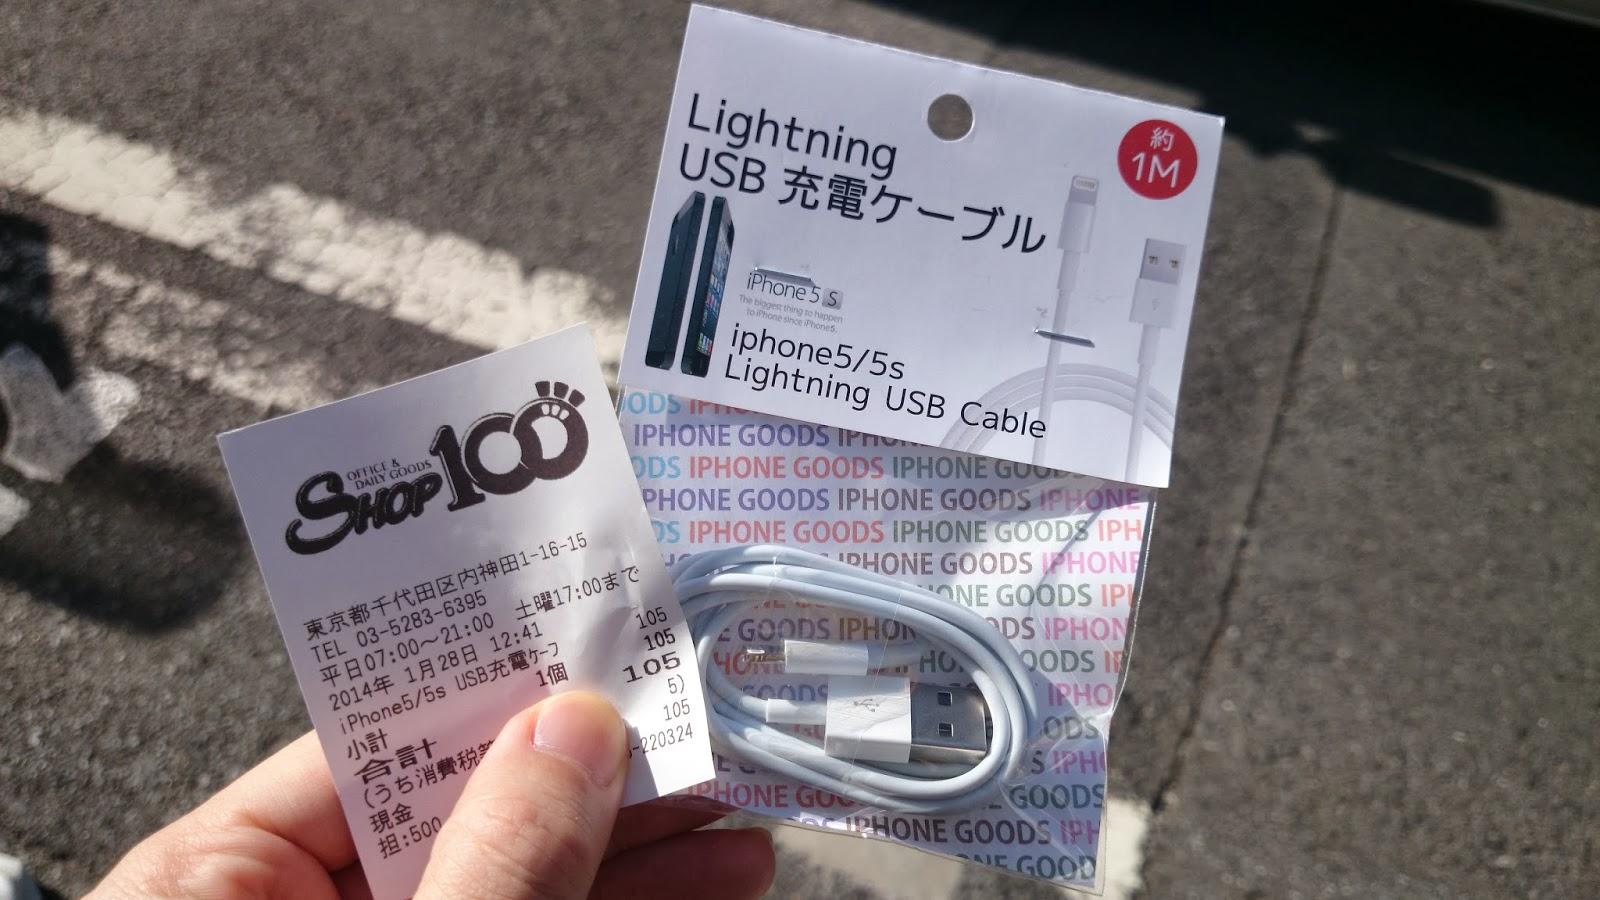 huhka.com 出張所: 100均のLightningケーブルでiPhone 5cが充電・通信できた